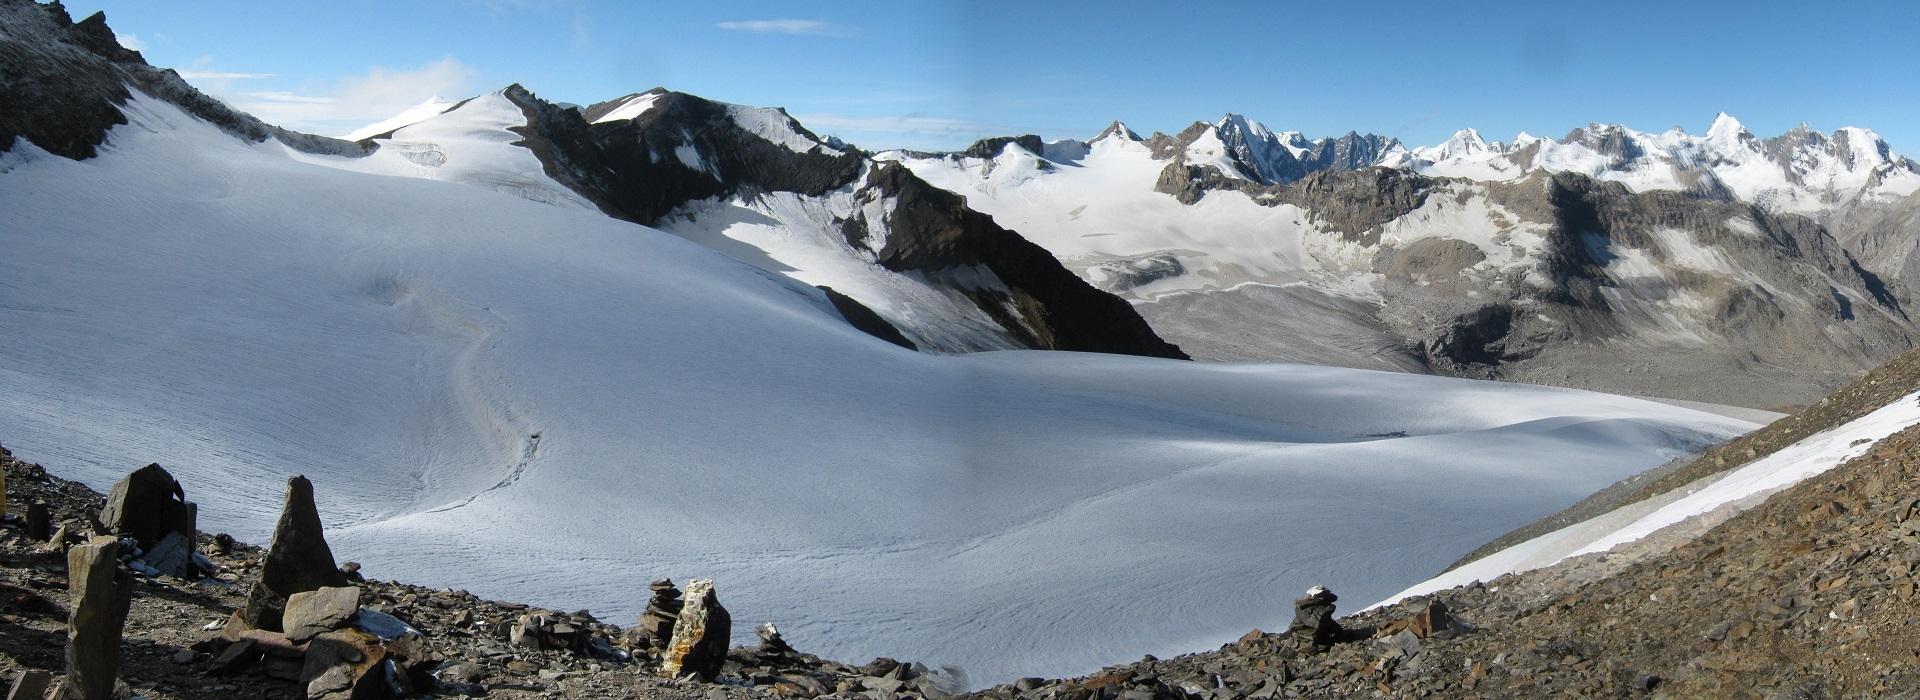 Pin Parvati Pass 5,319 m / 17,450 feet